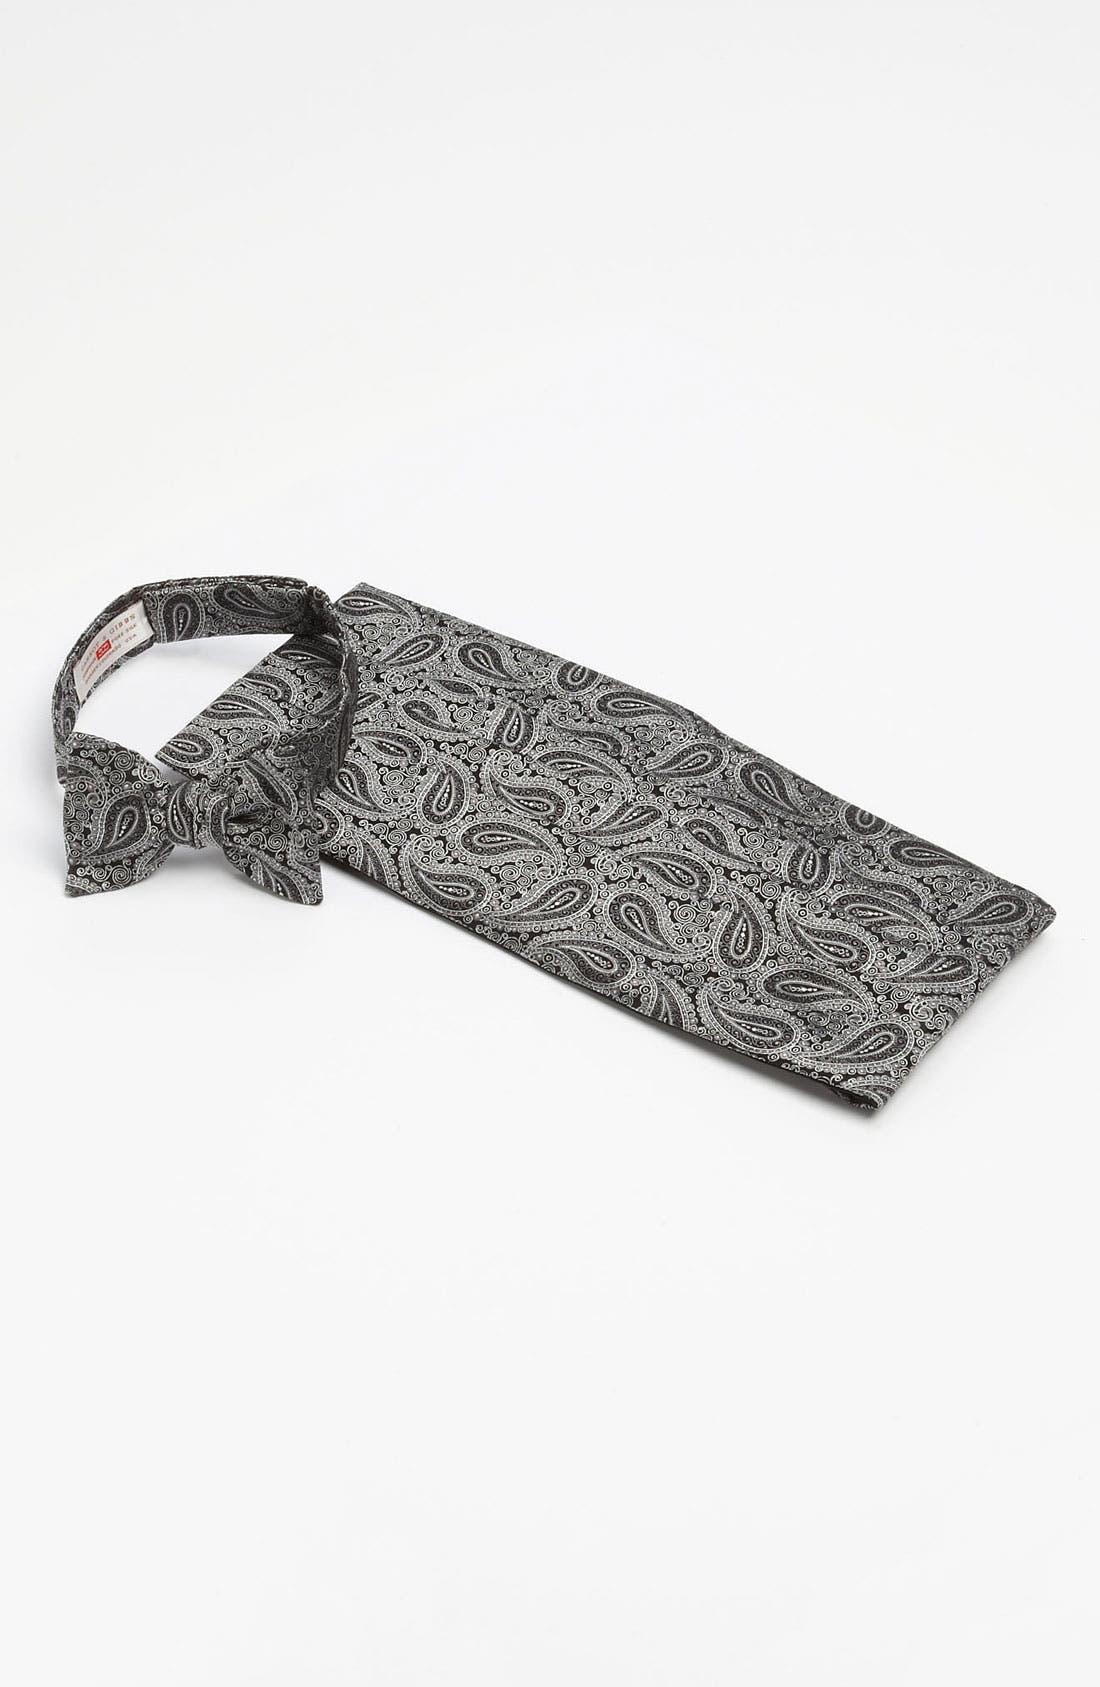 Alternate Image 1 Selected - Carrot & Gibbs Cummerbund & Bow Tie